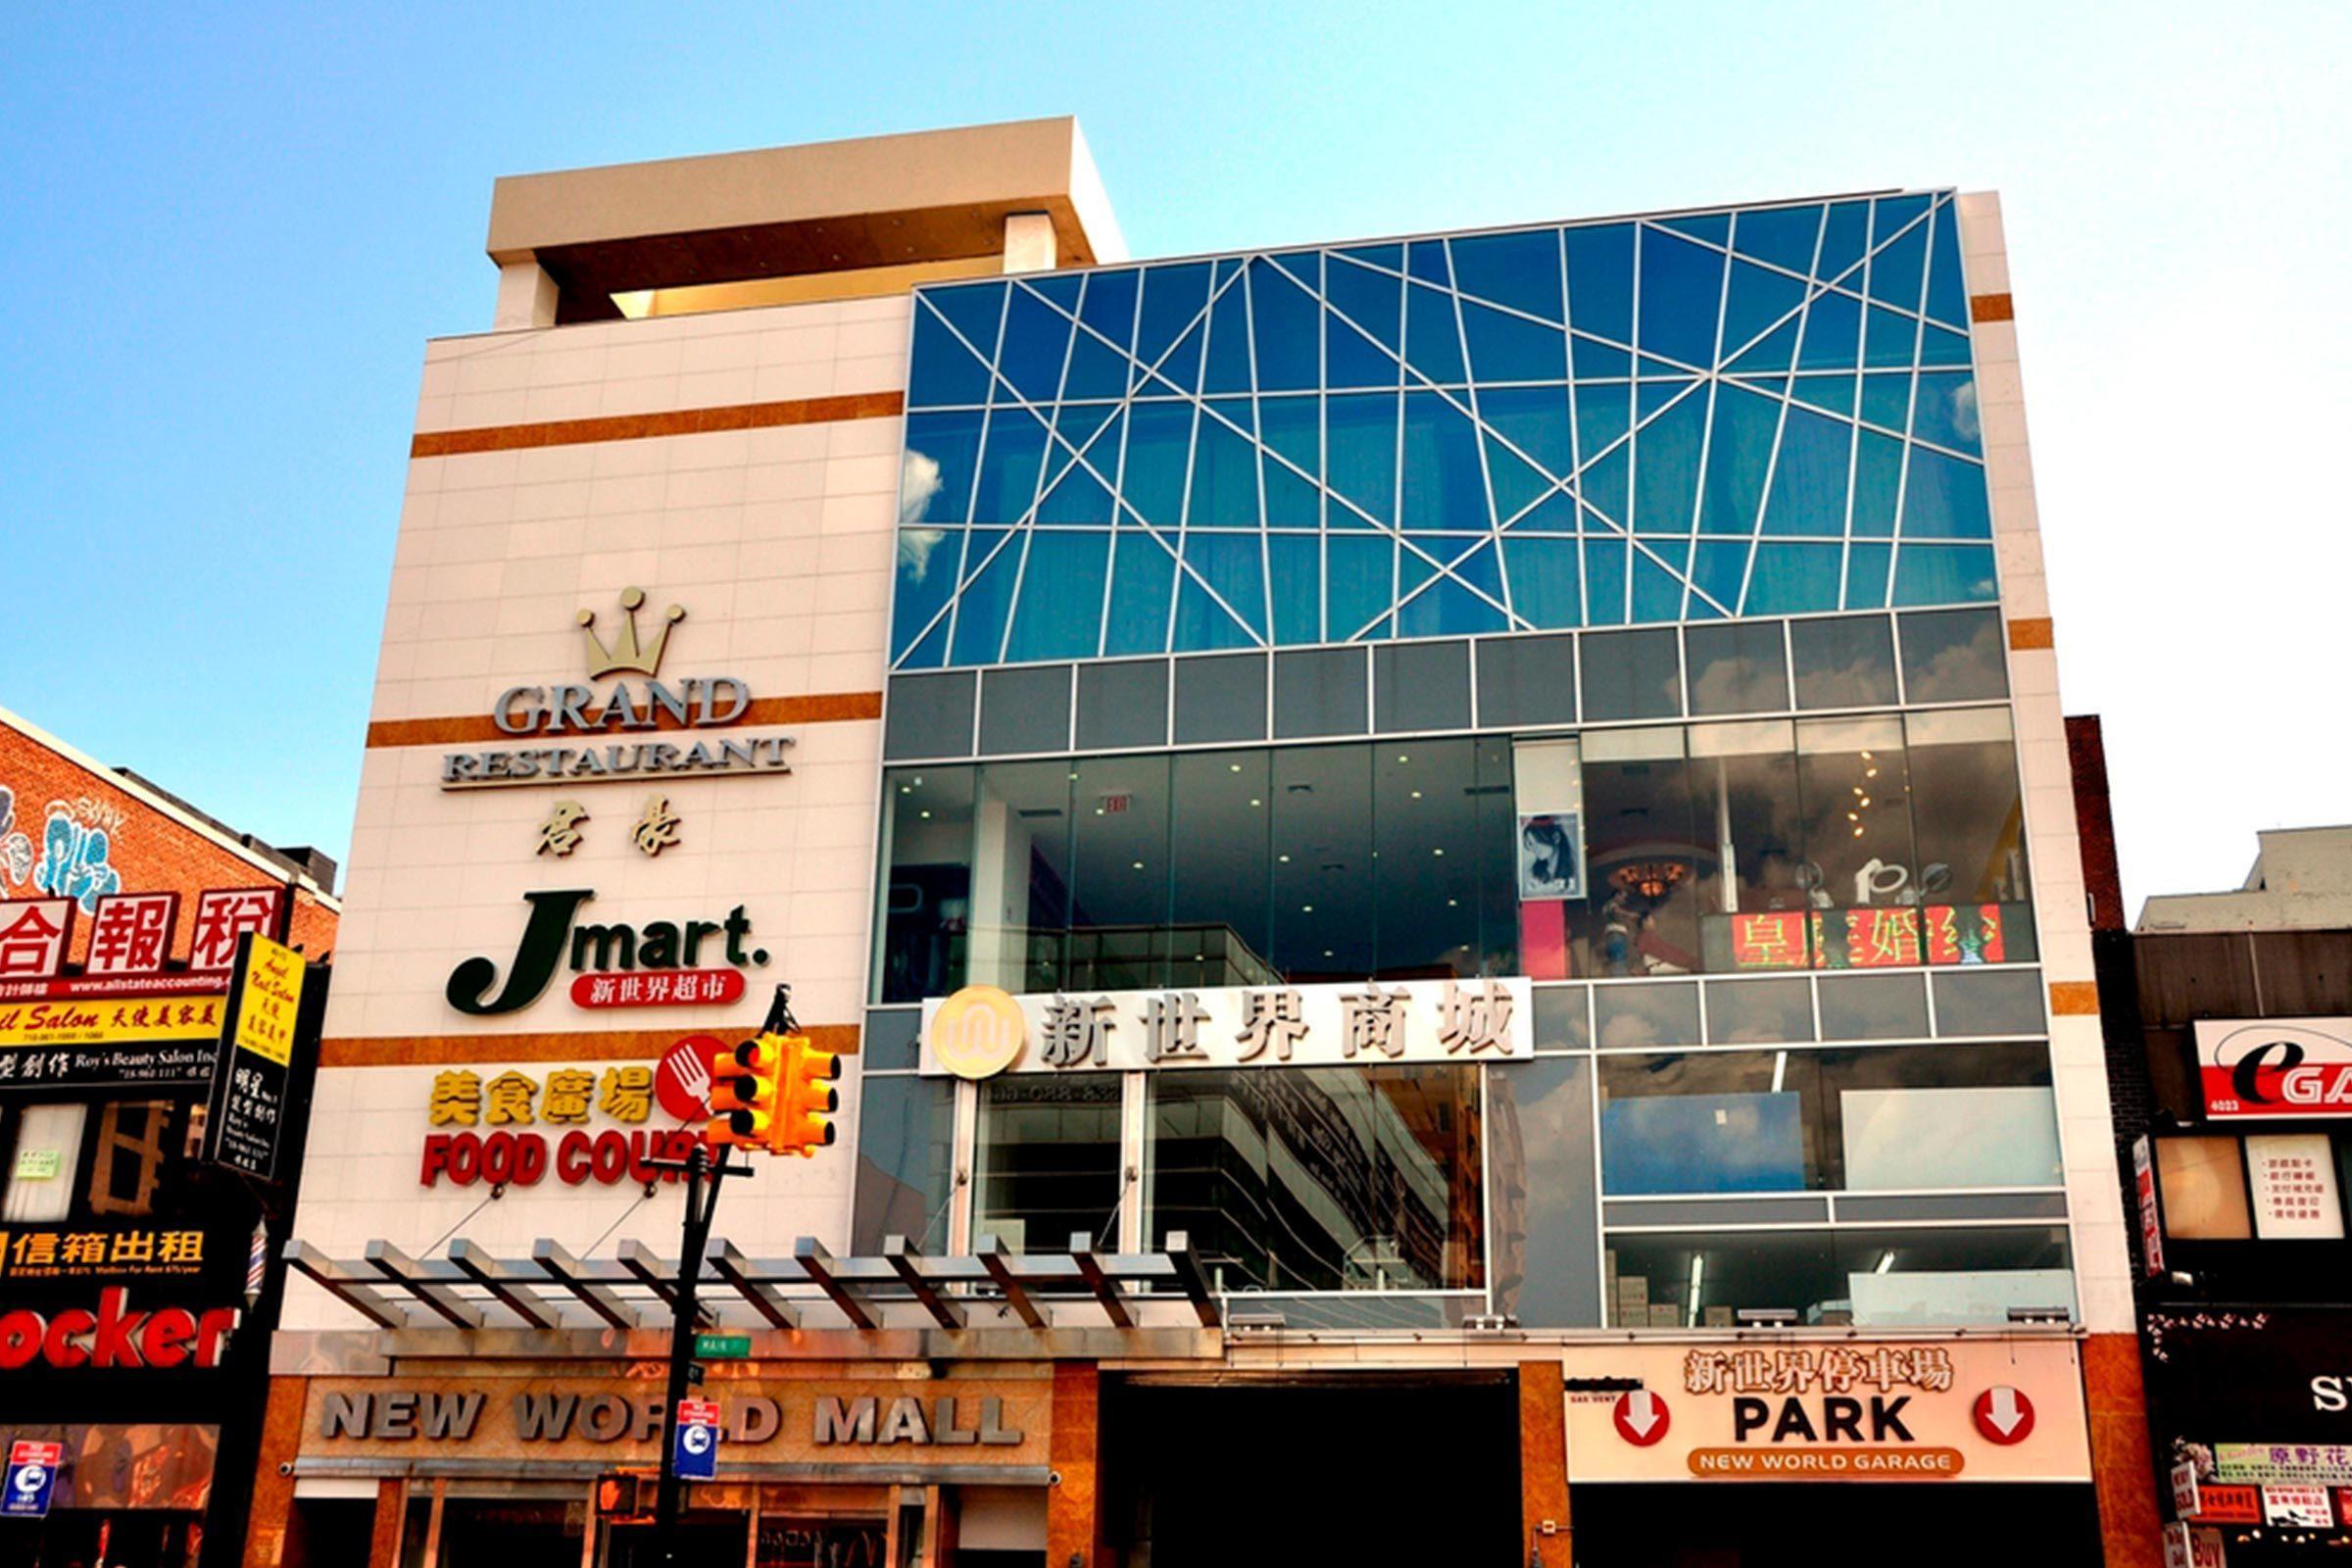 New World Mall